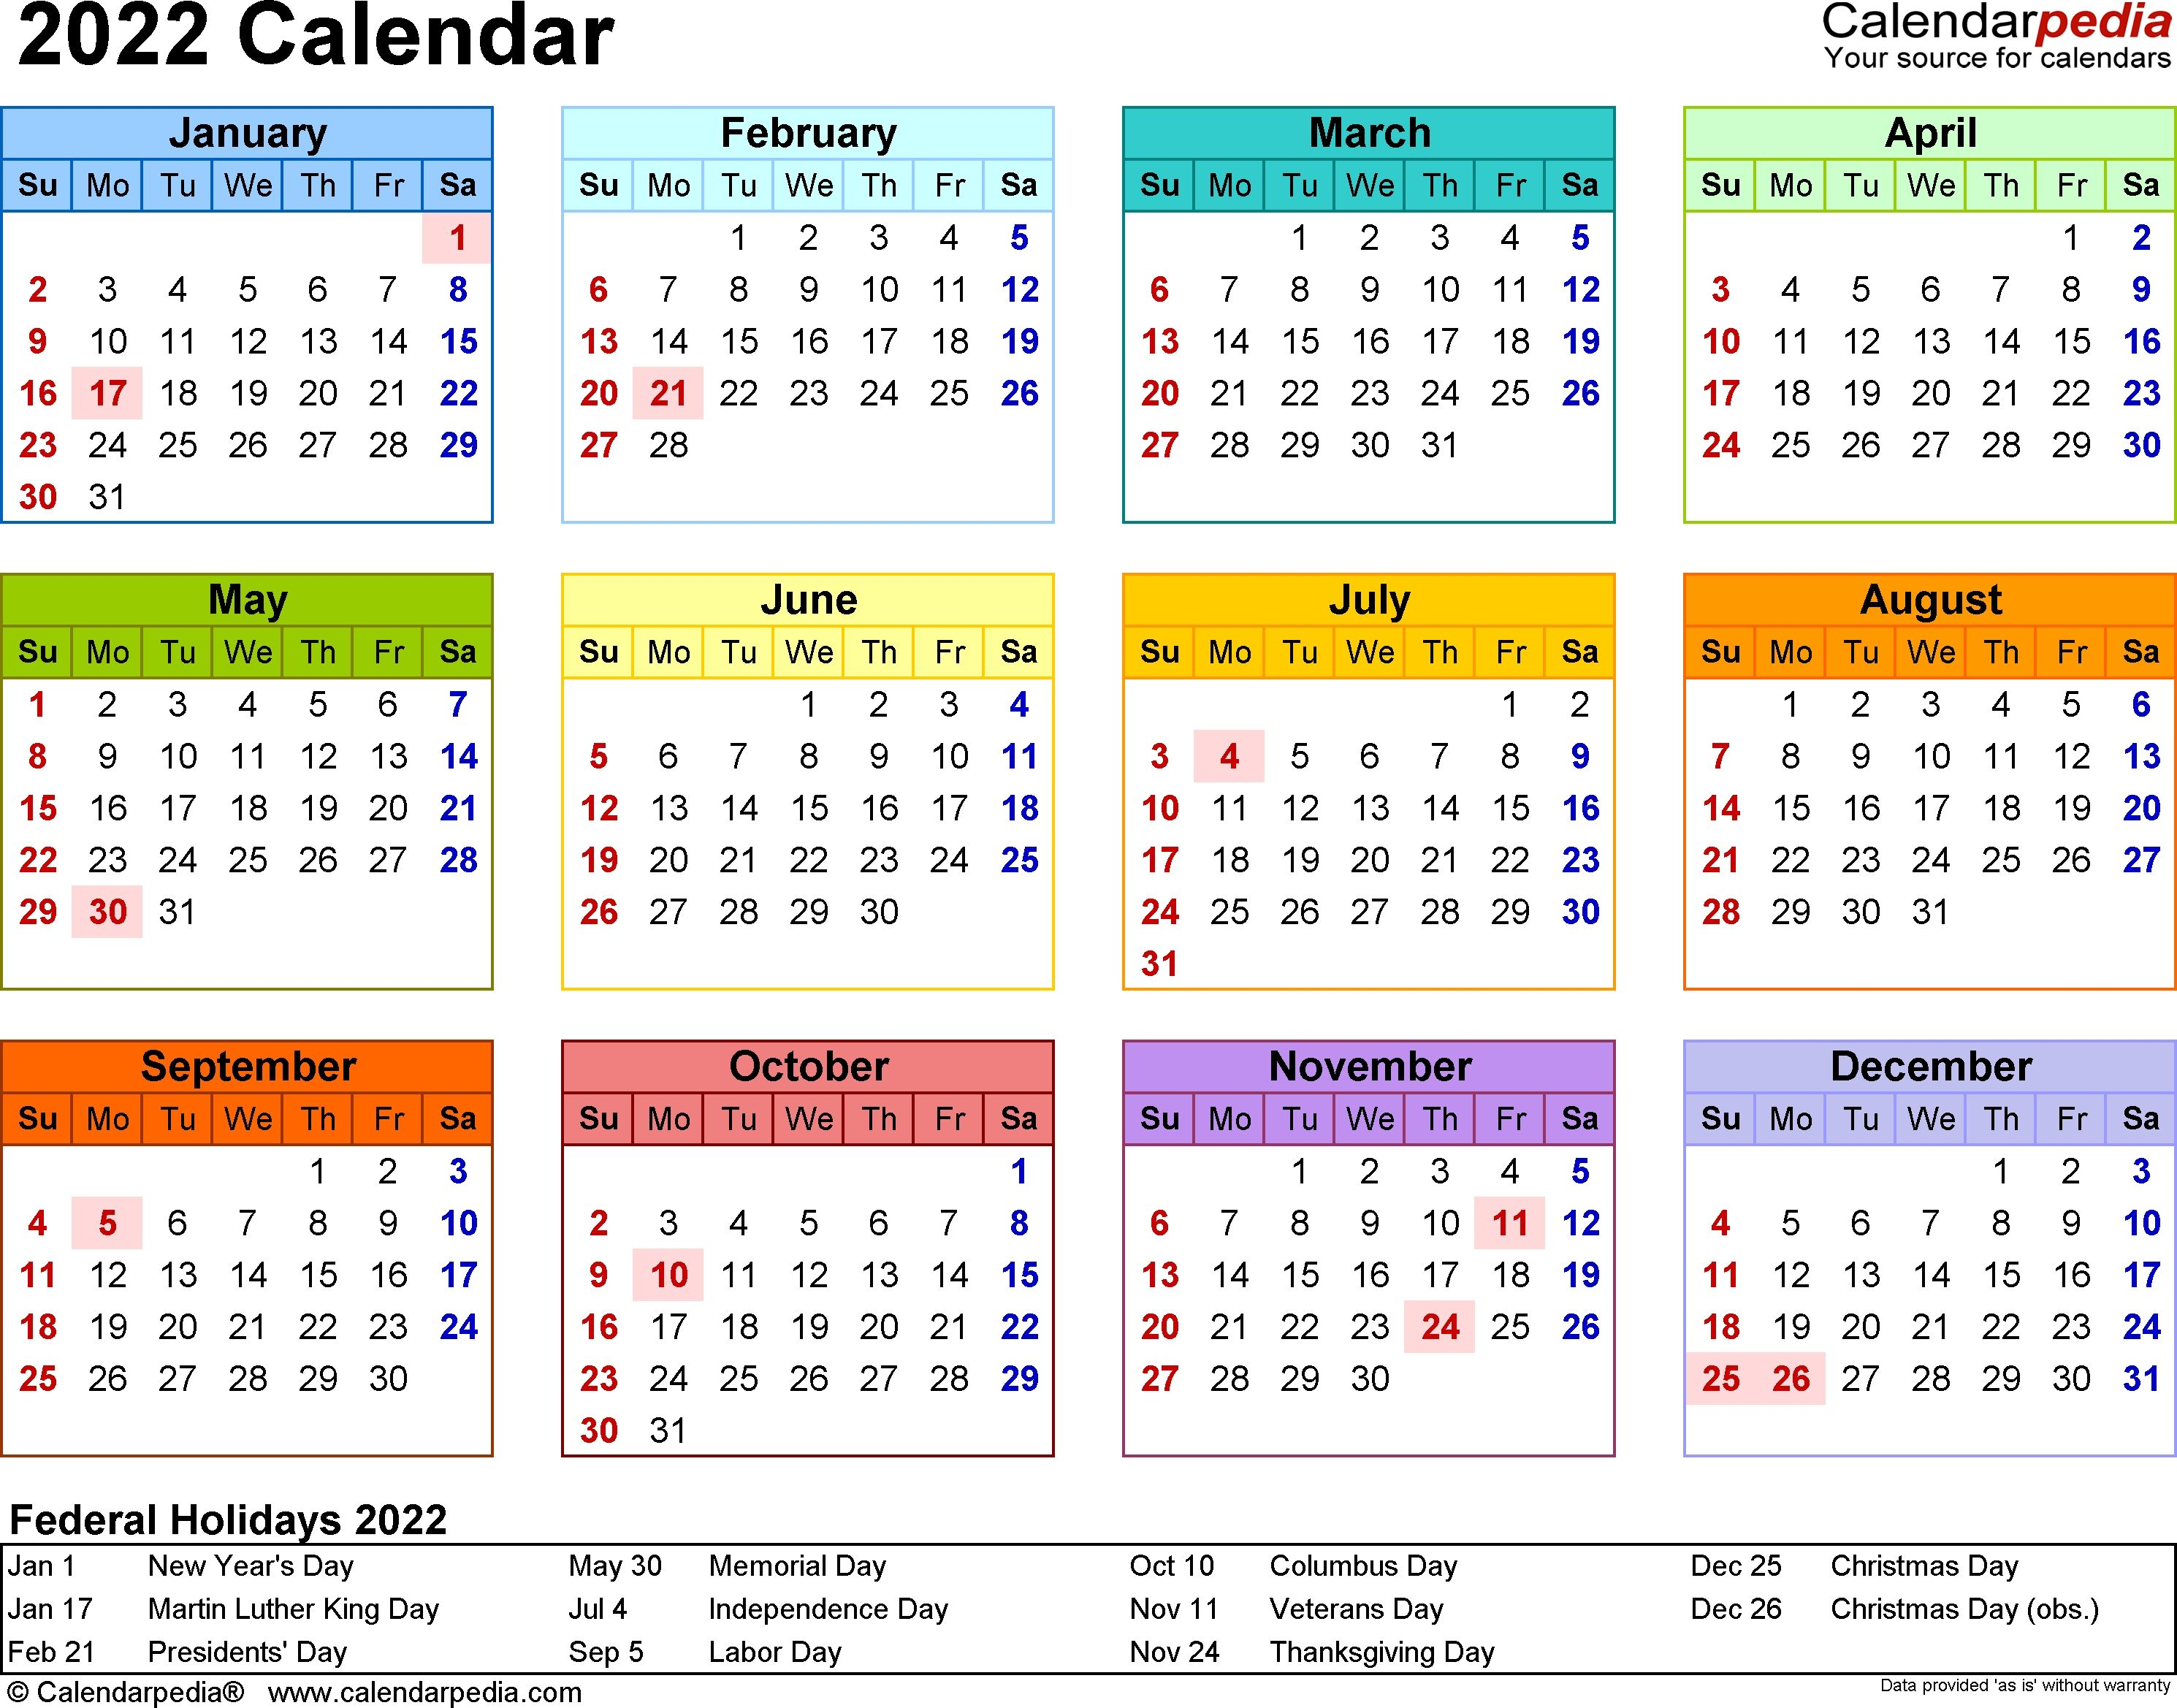 Why use a printable 2022 calendar? 2022 Calendar - 17 Free Printable Word Calendar Templates ...